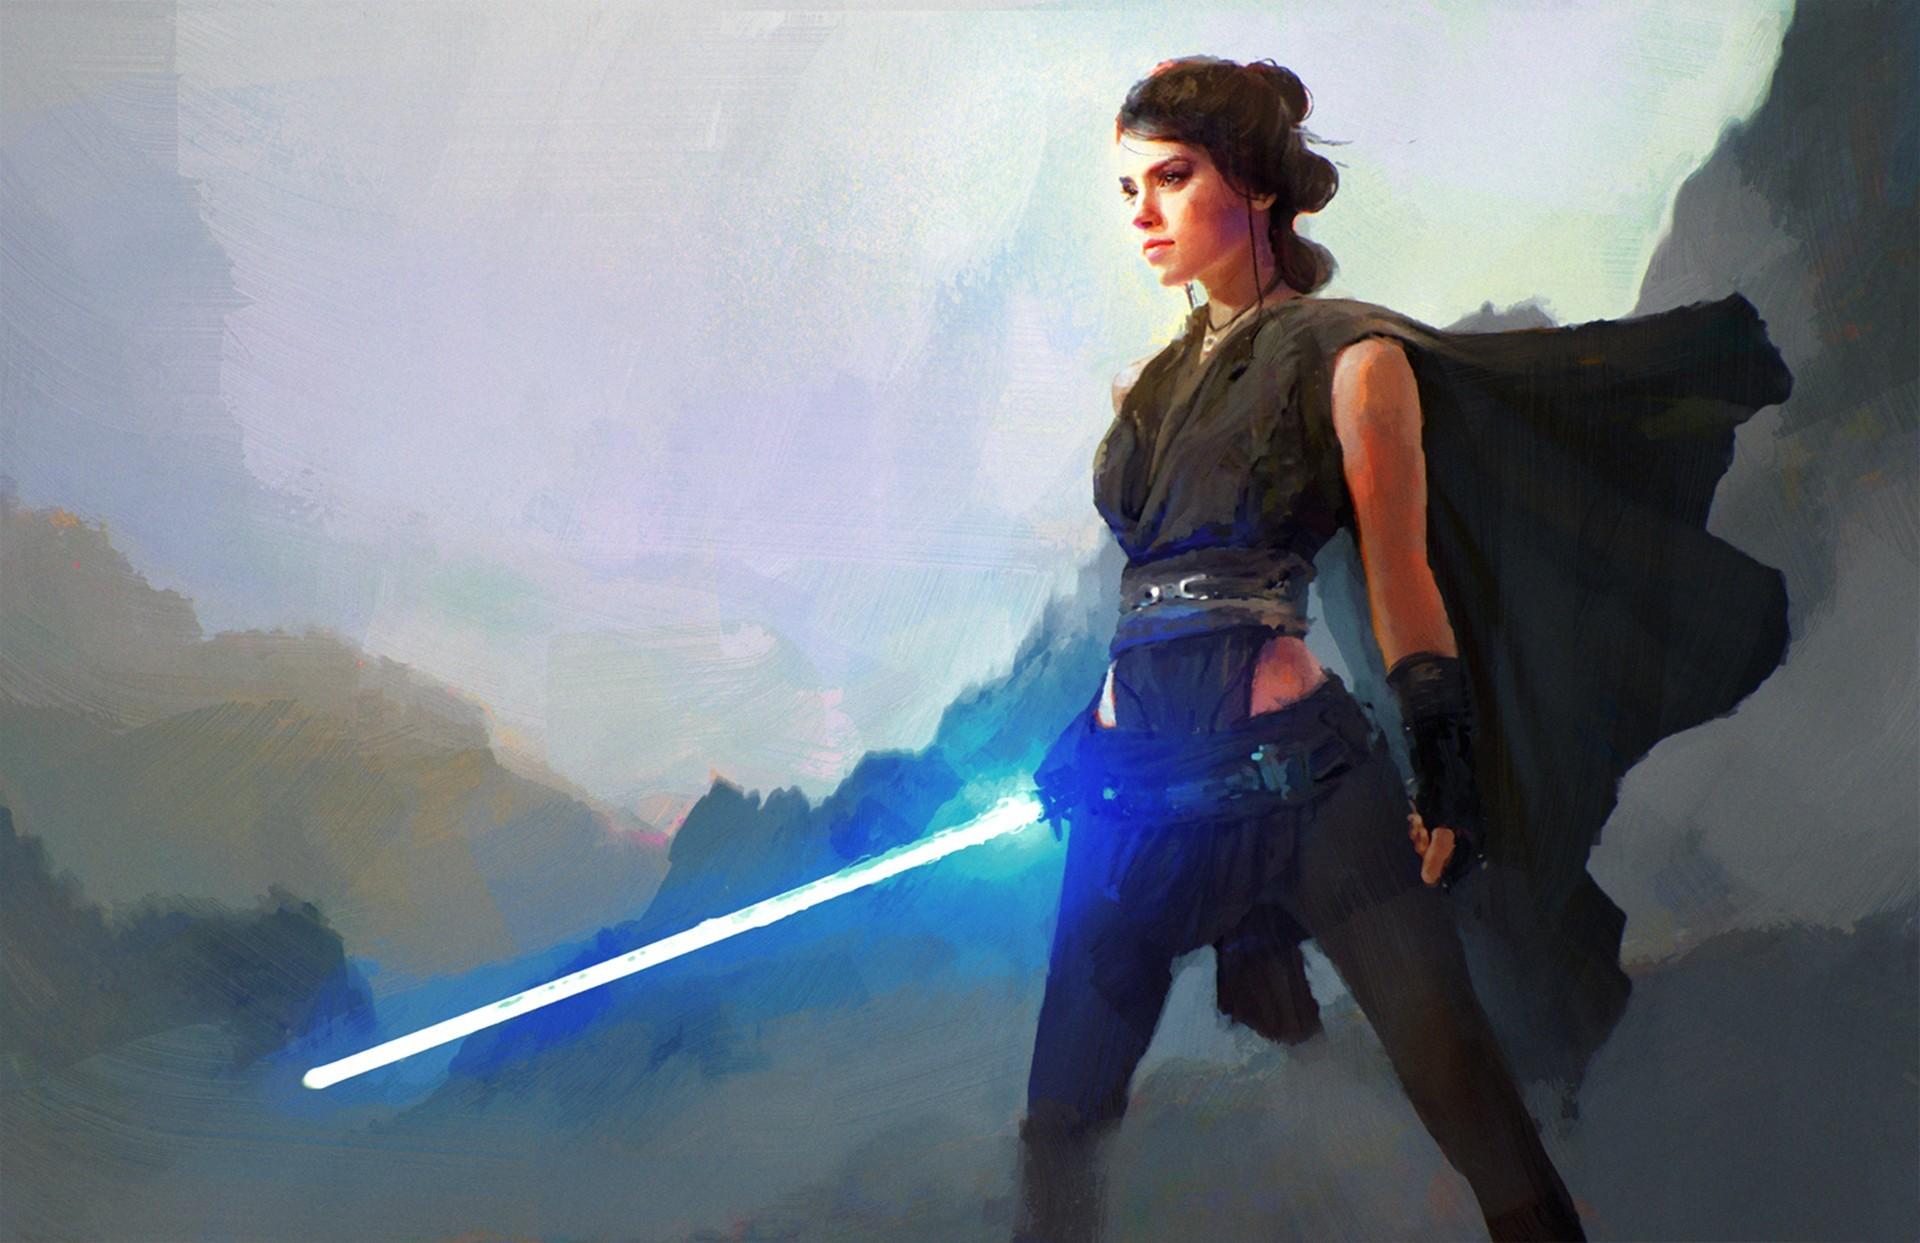 General Star Wars women artwork fantasy art science fiction Jedi  lightsaber Rey Daisy Ridley